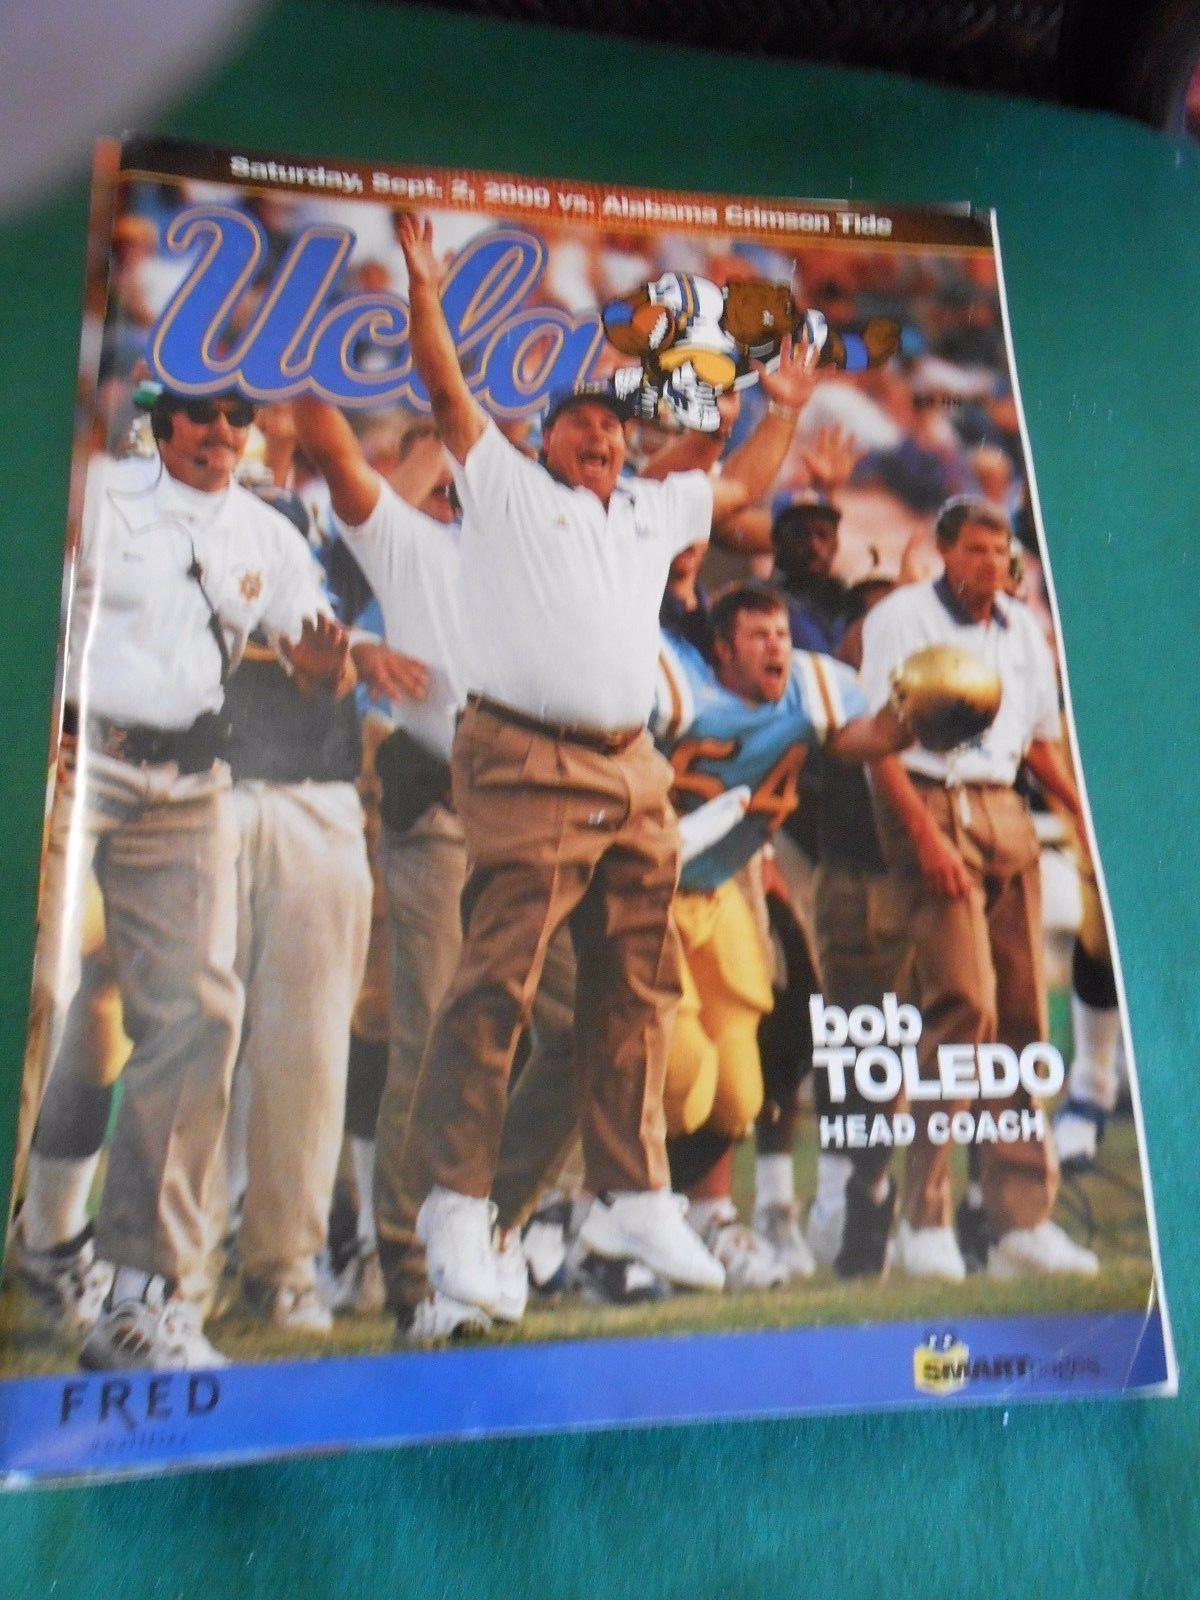 Great Collectible 2000 UCLA vs.  ALABAMA Crimson Tide Football Game Program - $14.54